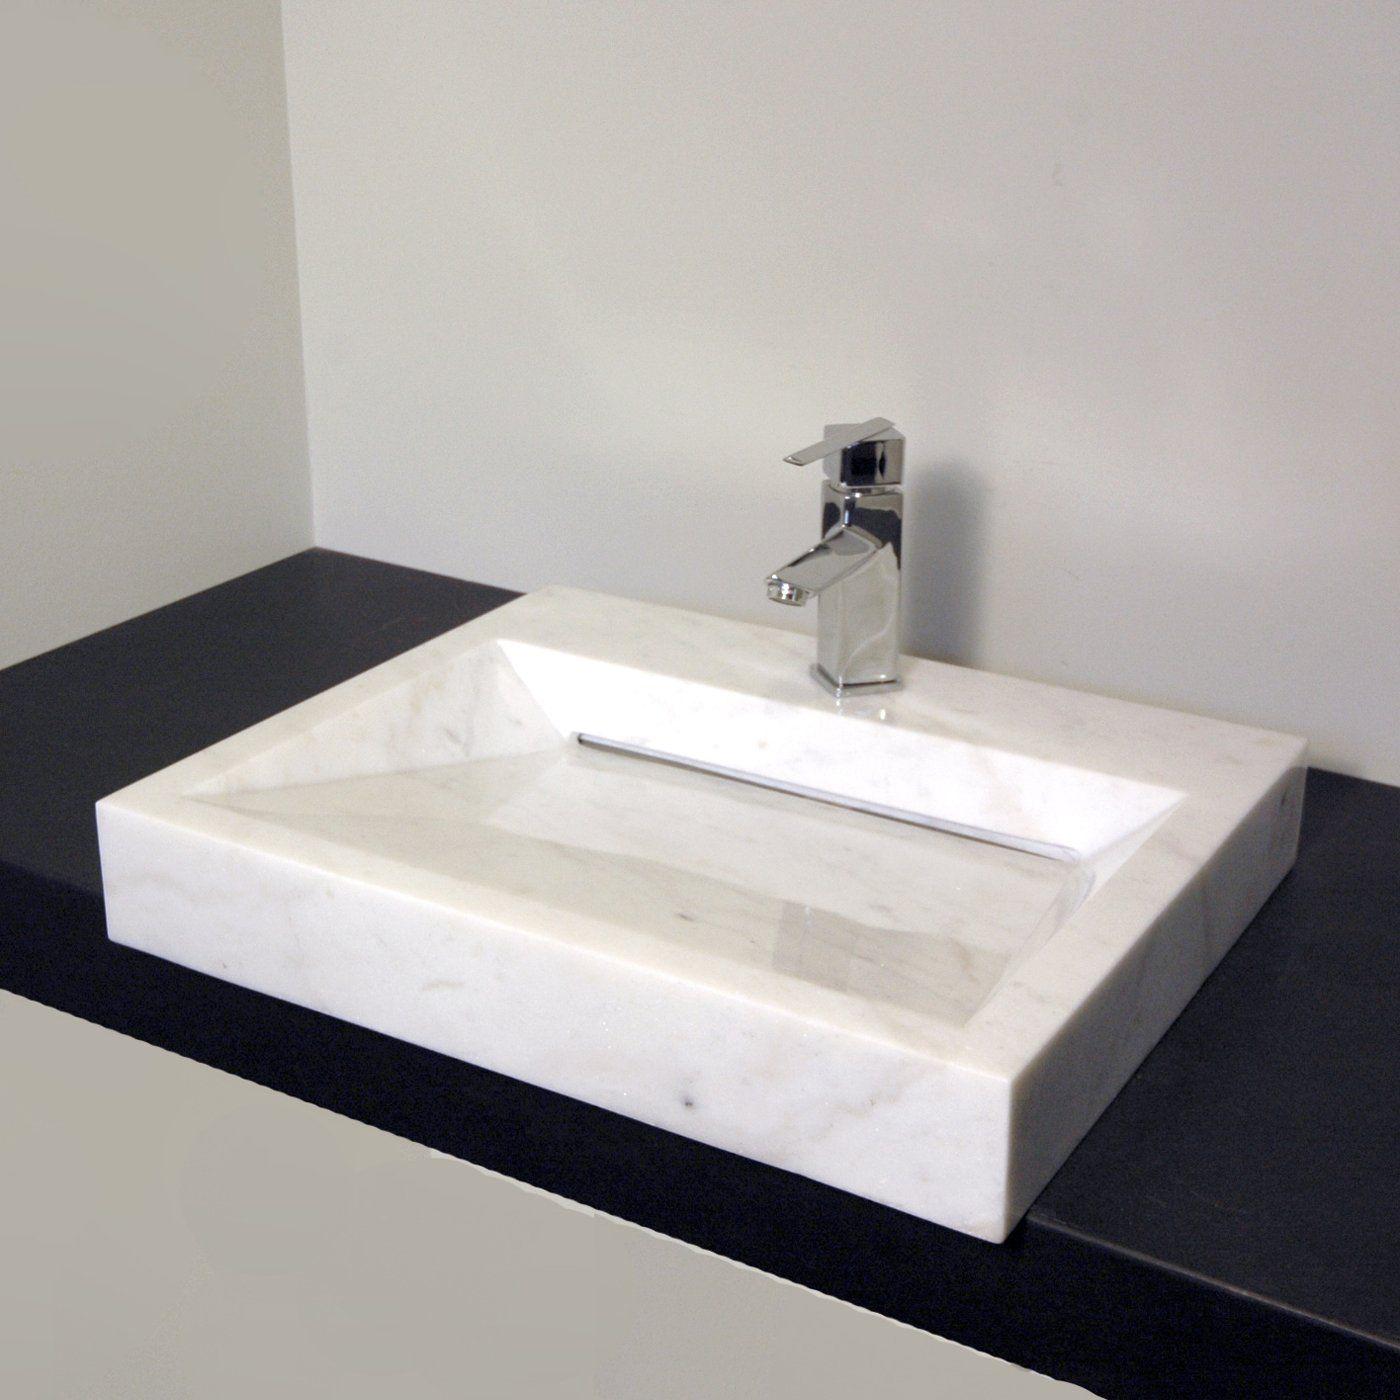 Bathroom Sinks Lowes Canada cantrio koncepts rs-107 stone series bianco carrera vessel sink